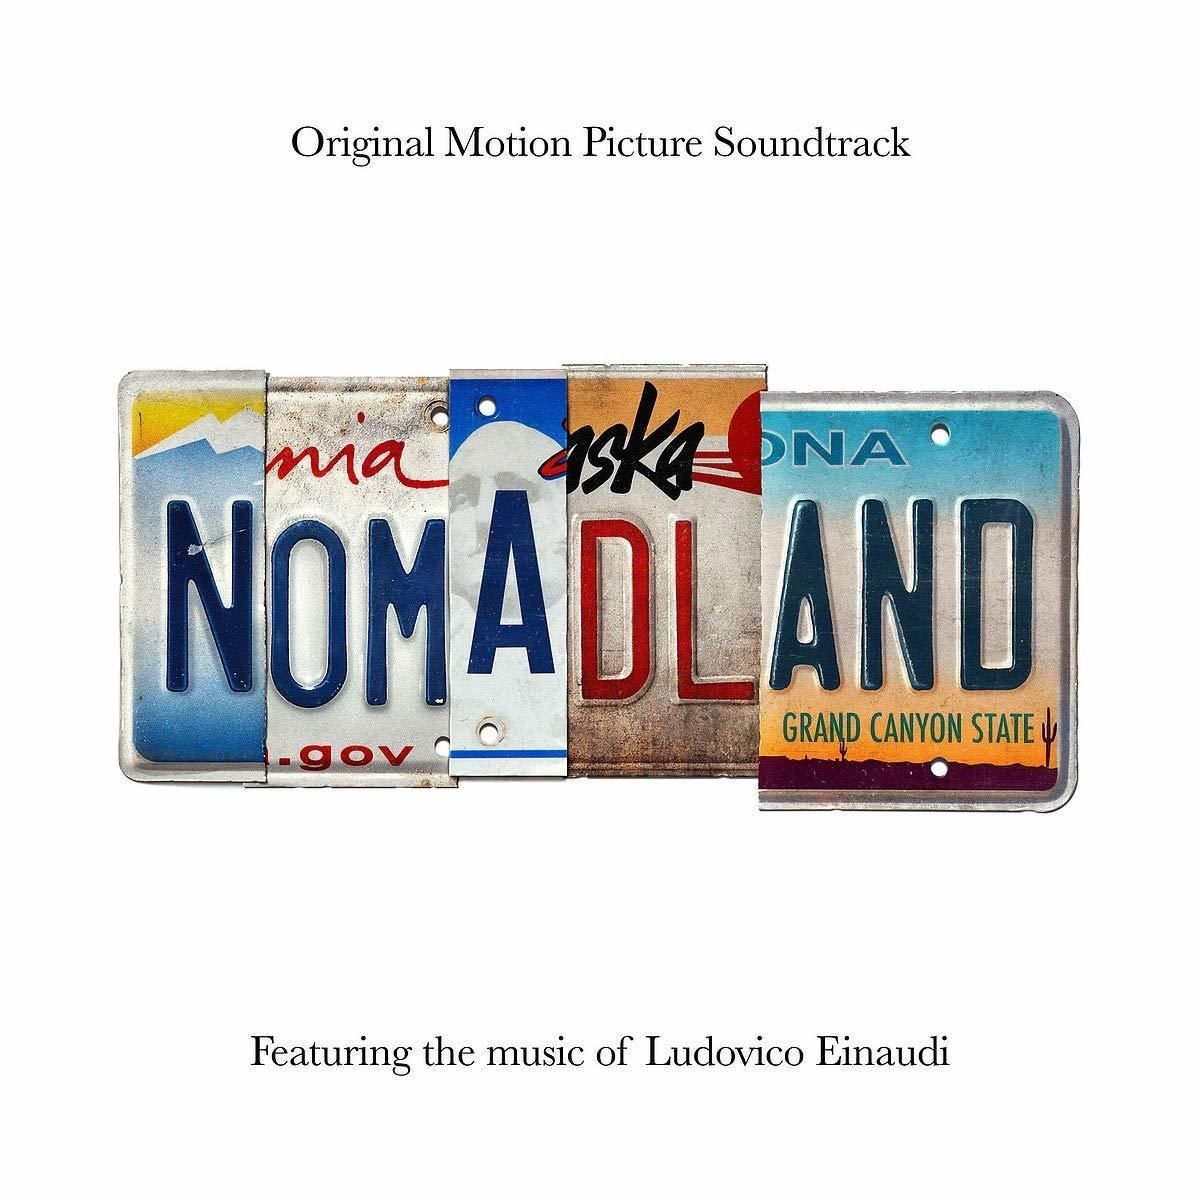 Nomadland - okładka soundtracku CD (front)